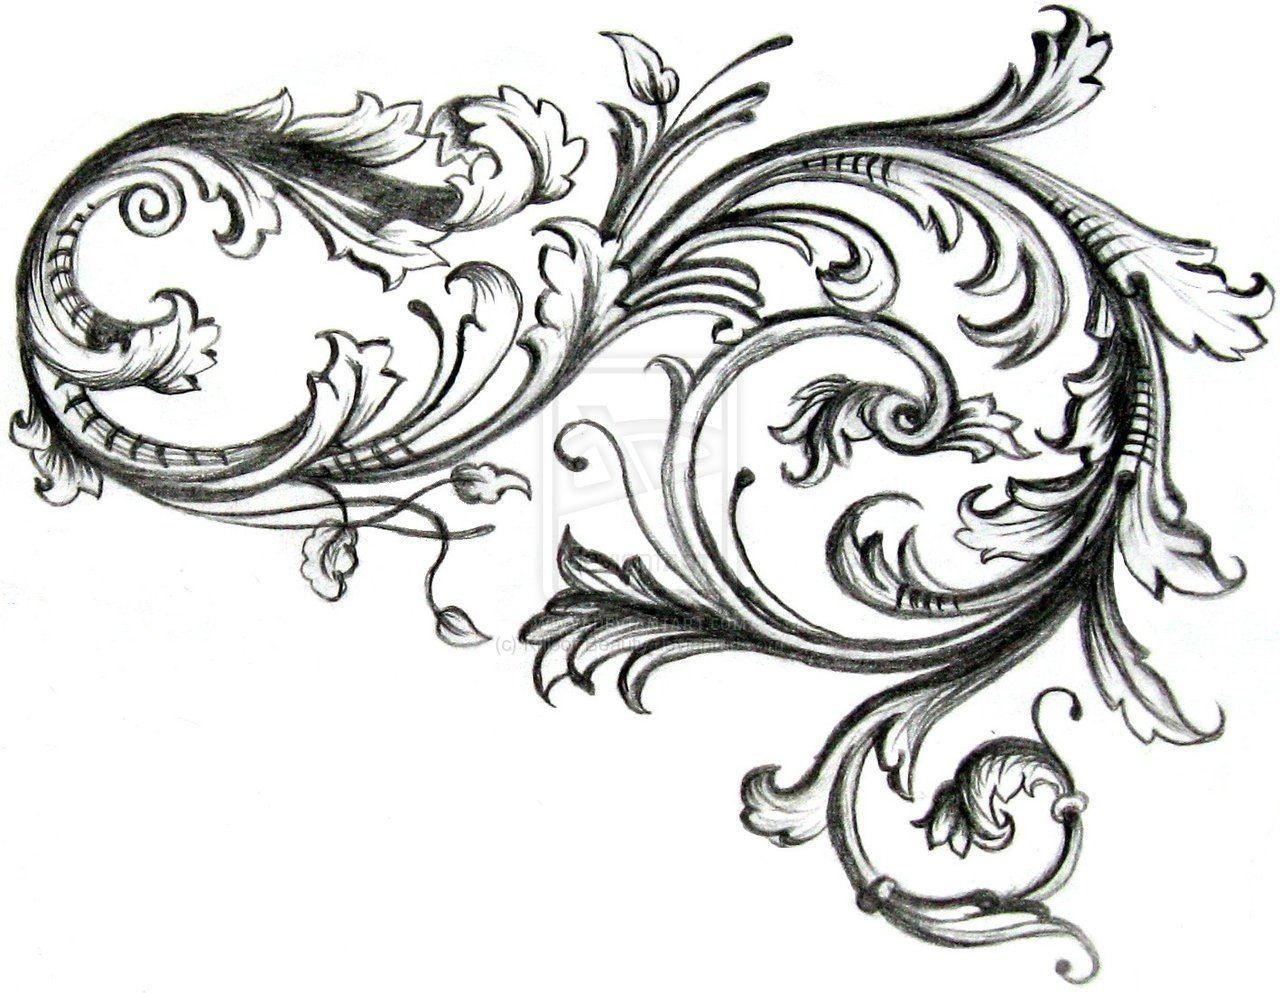 Scrollwork Filigree Tattoo Tattoo Sleeve Filler Tattoo Filler,Worst Pokemon Designs Gen 1